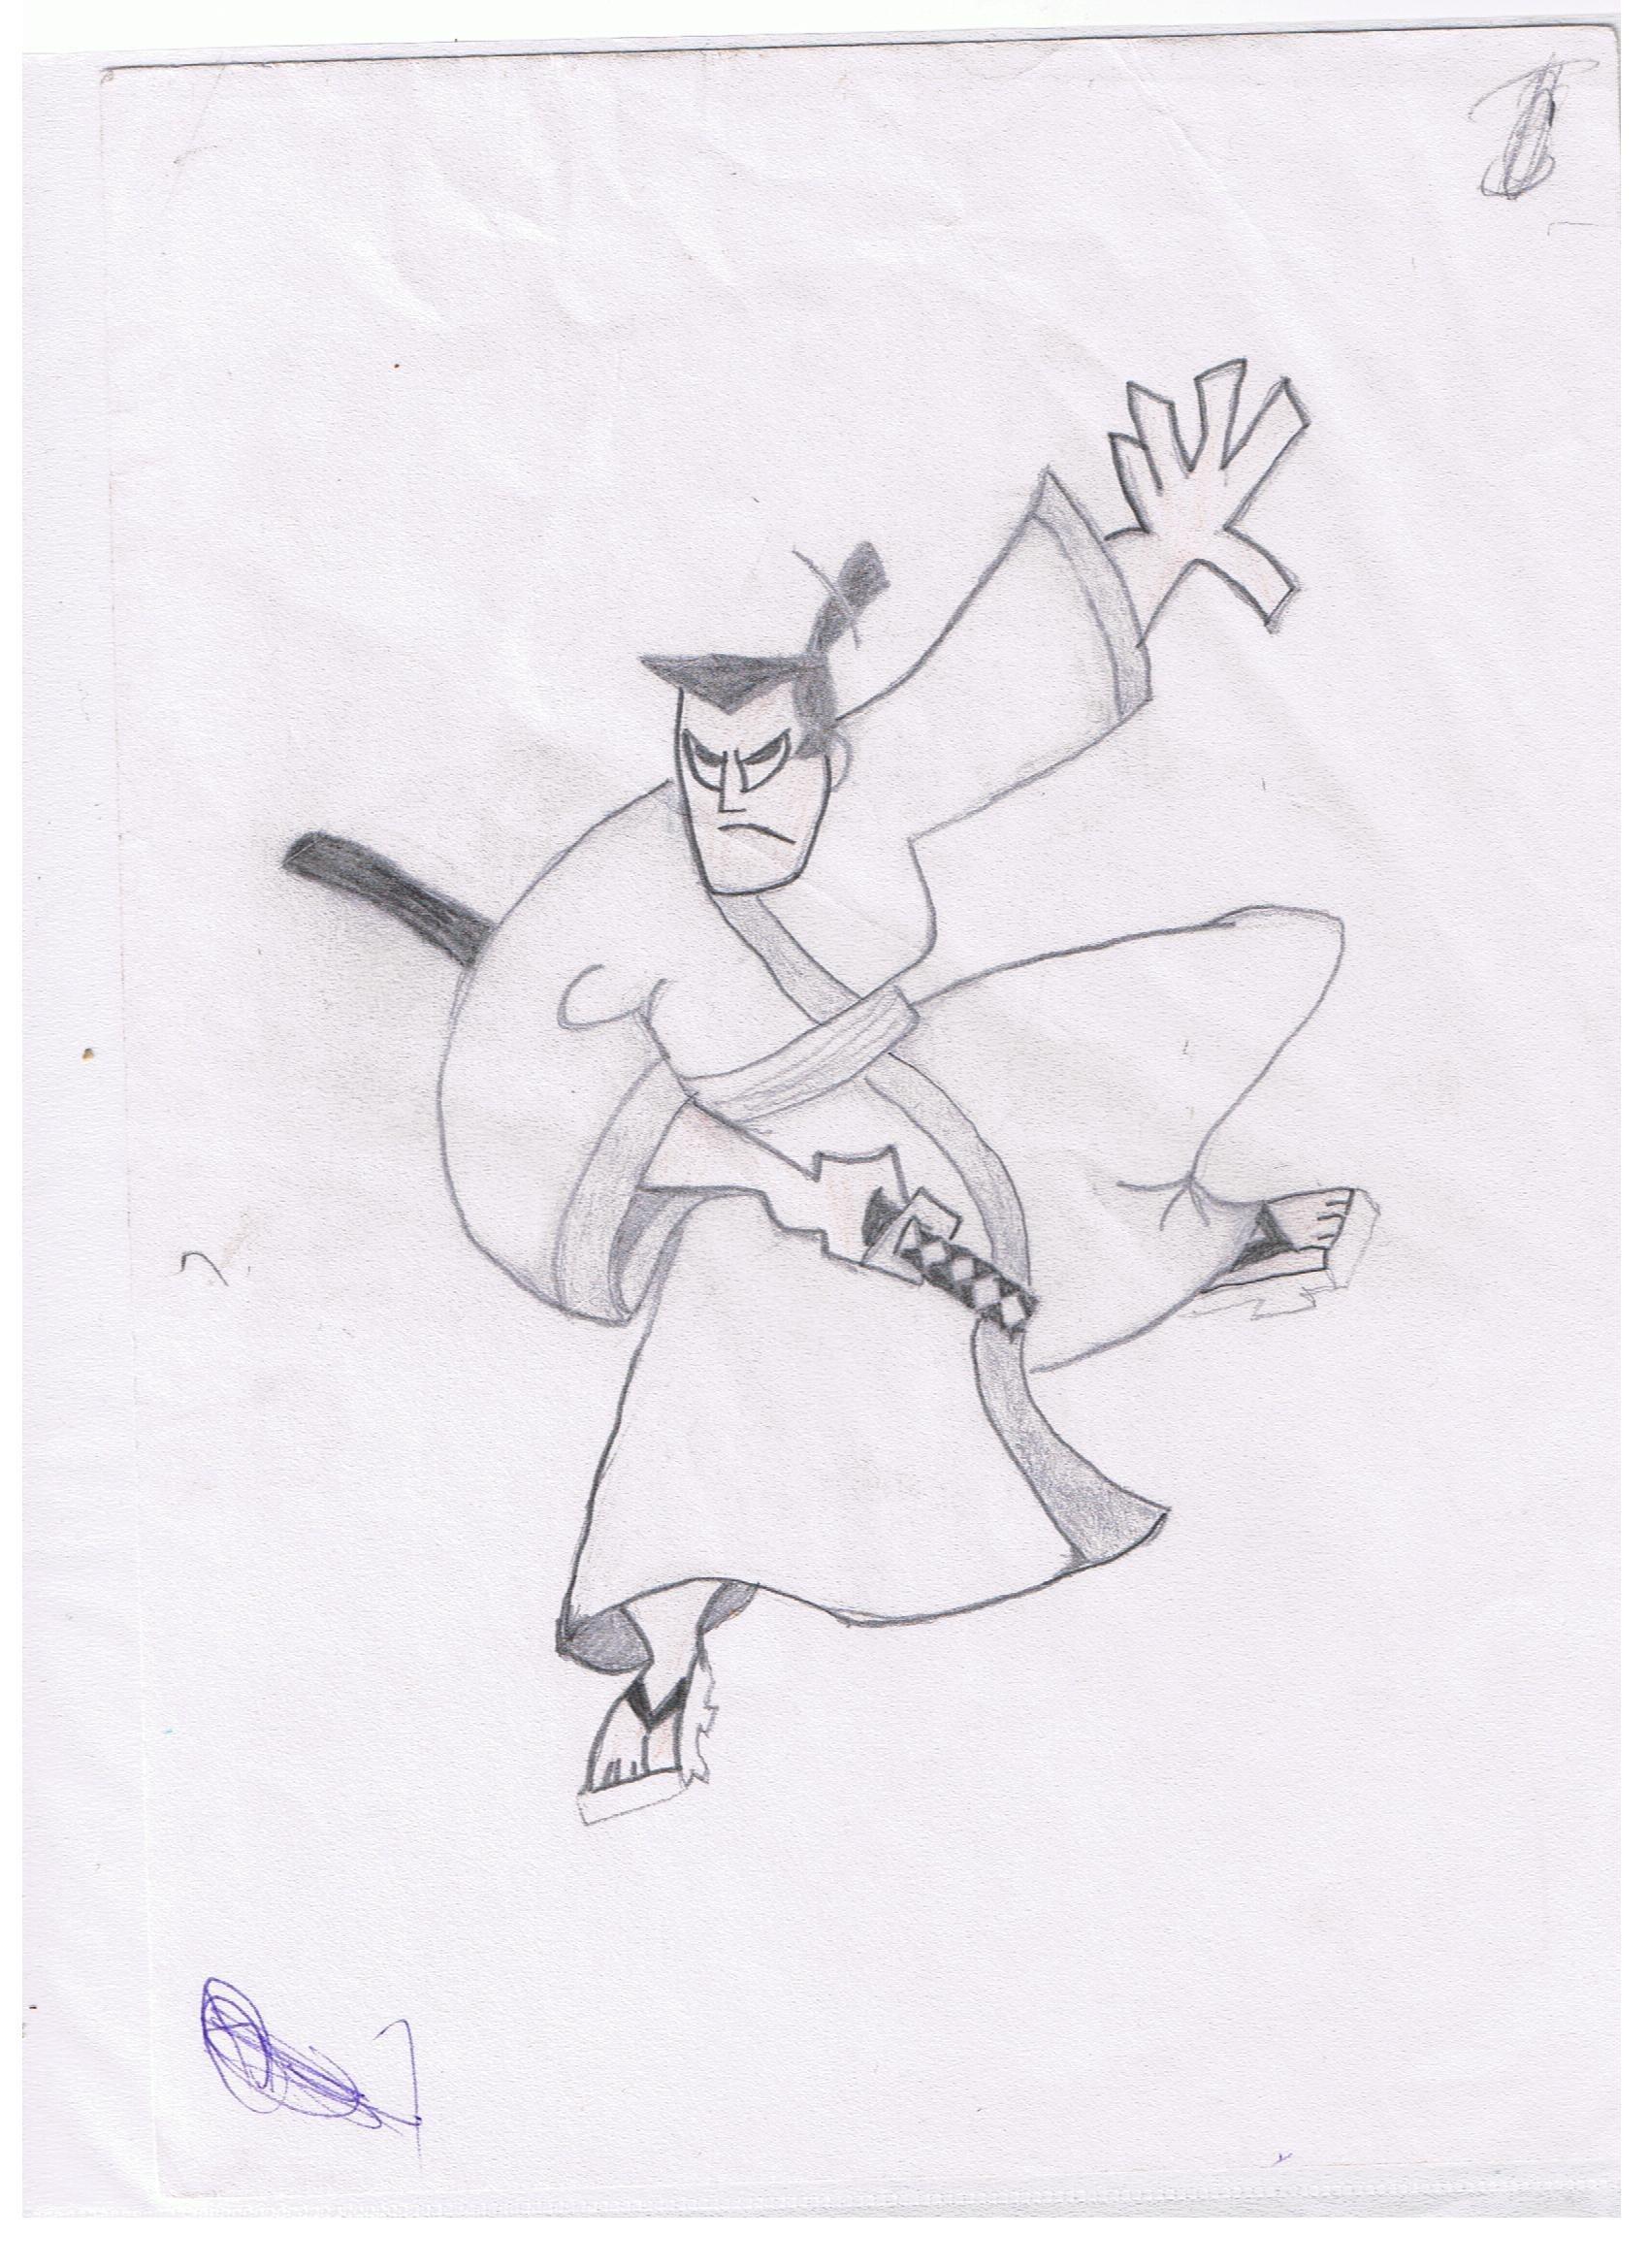 Drawn samurai hd wallpapers Images photos Samurai HD drawing